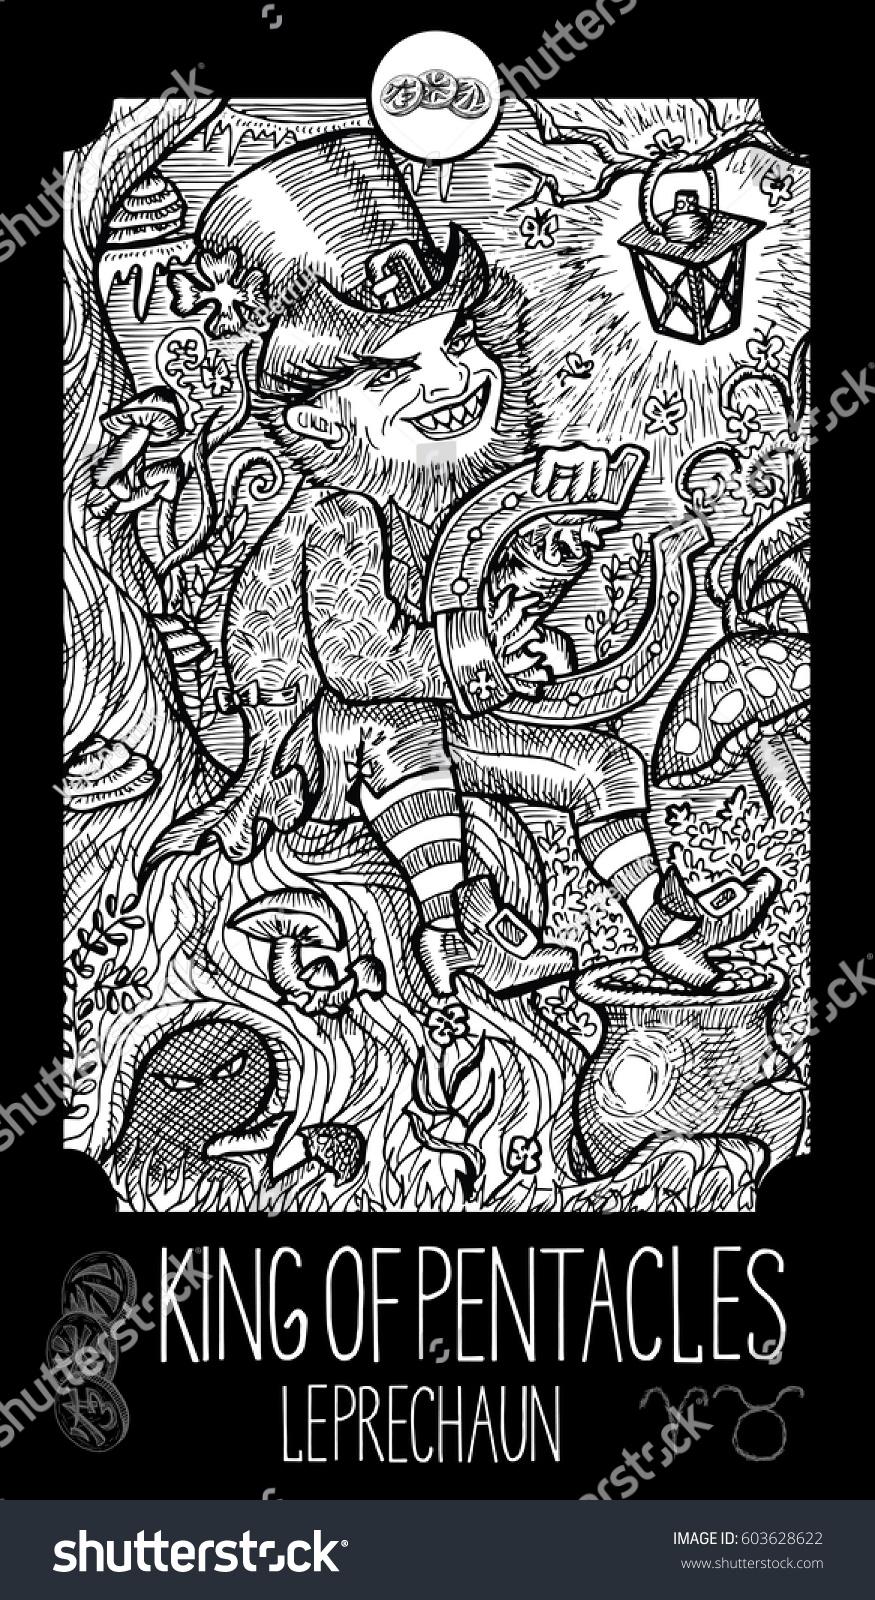 King pentacles leprechaun minor arcana tarot stock vector leprechaun minor arcana tarot card fantasy line art illustration ccuart Choice Image